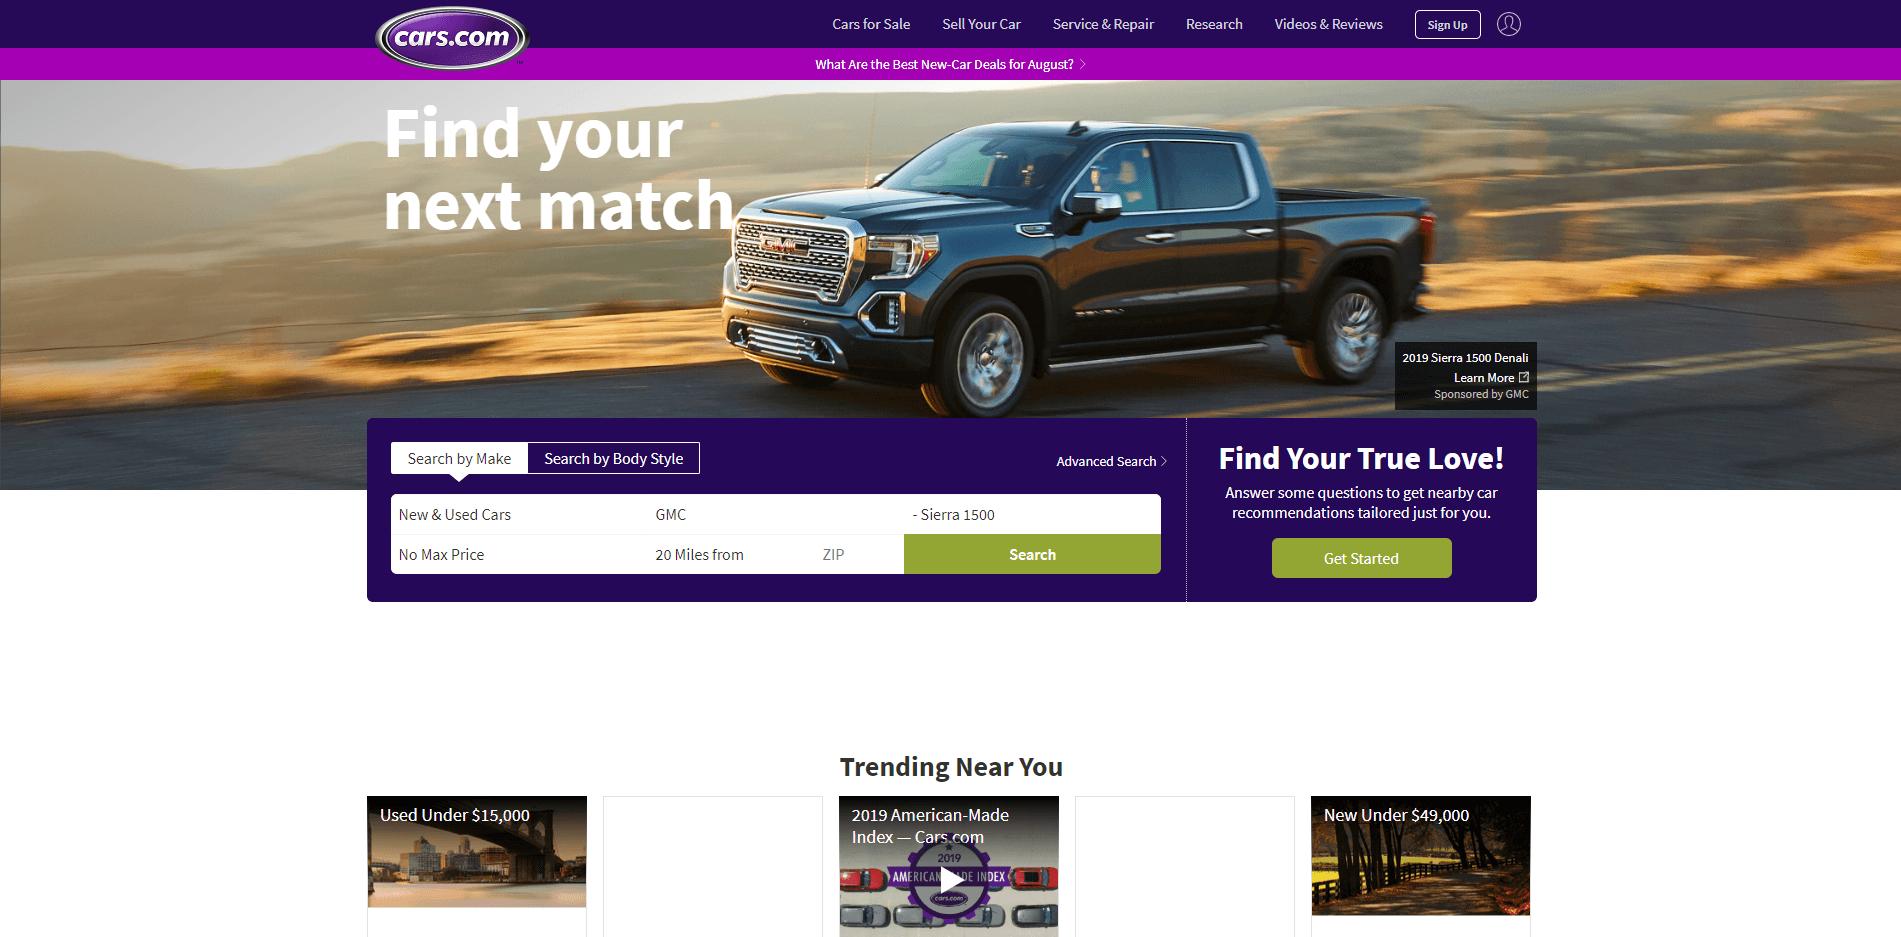 car.com website's picture